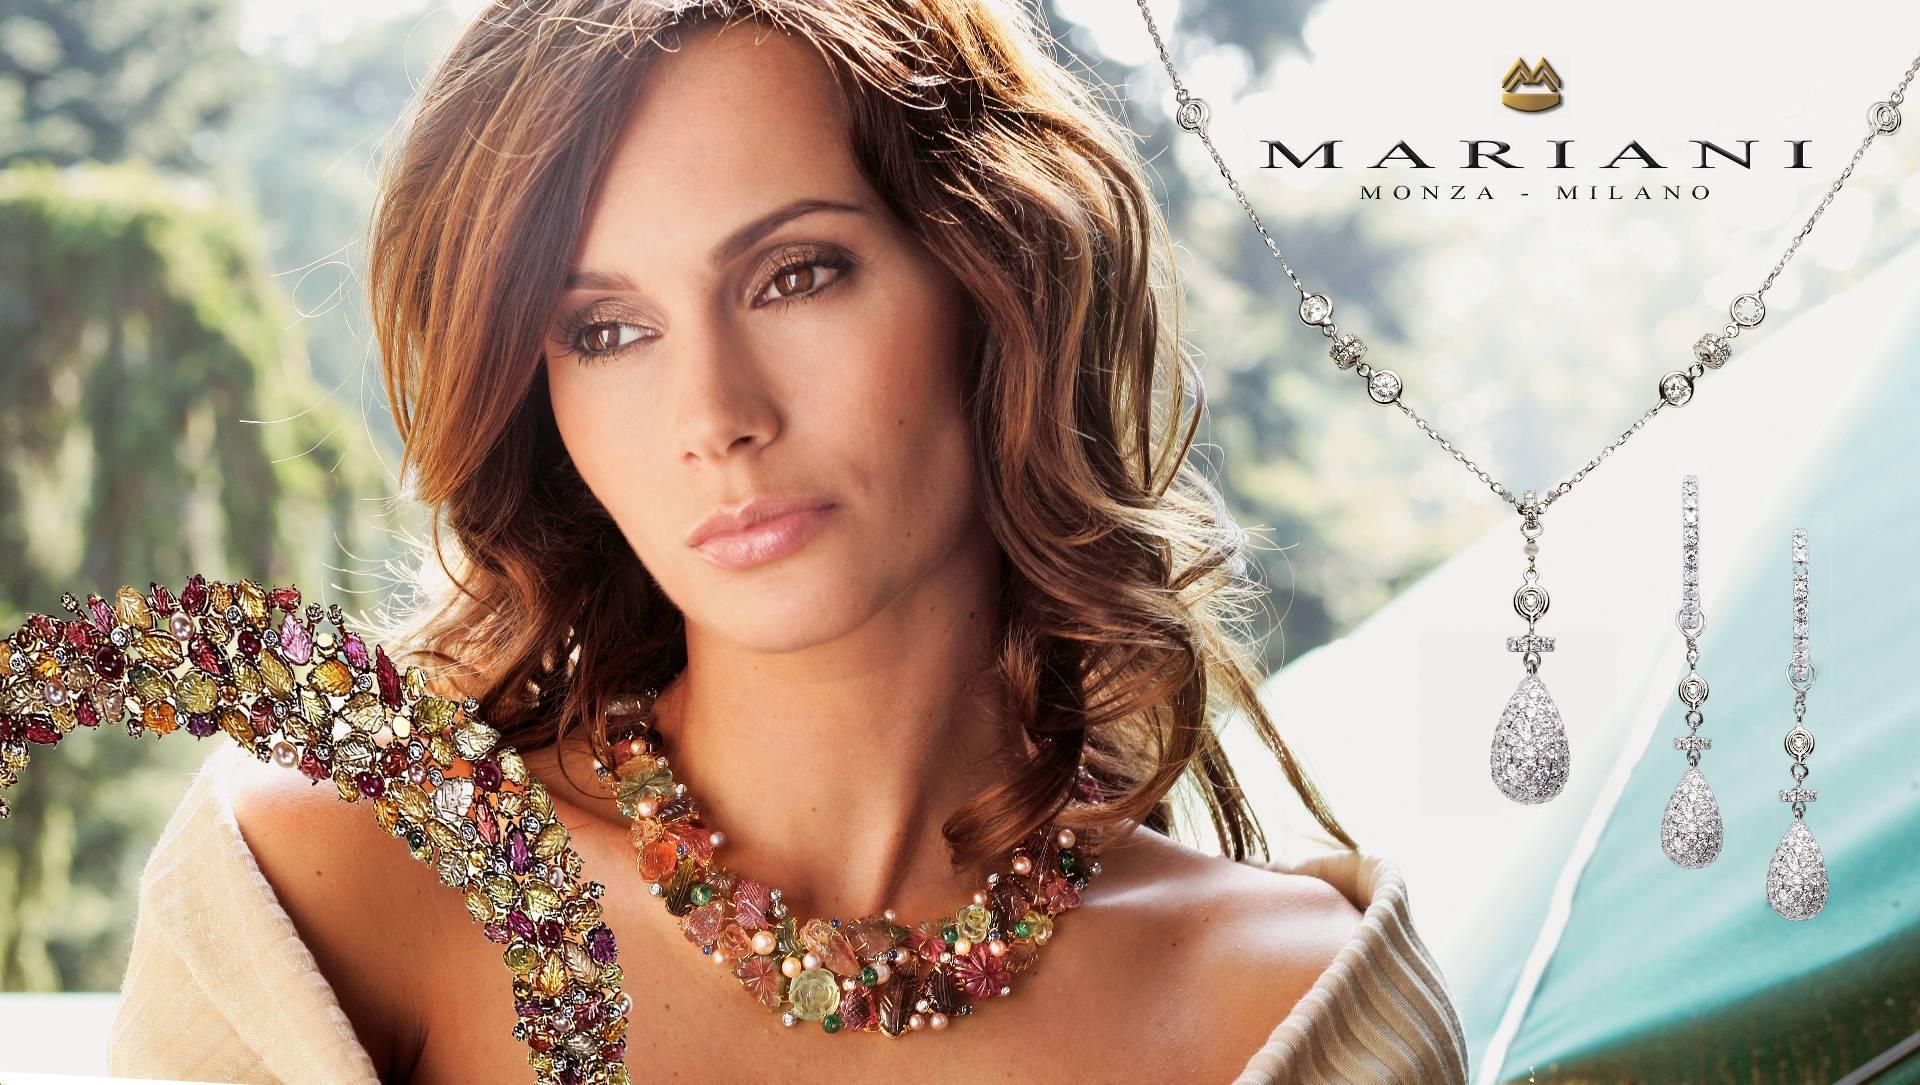 mariani-min-1